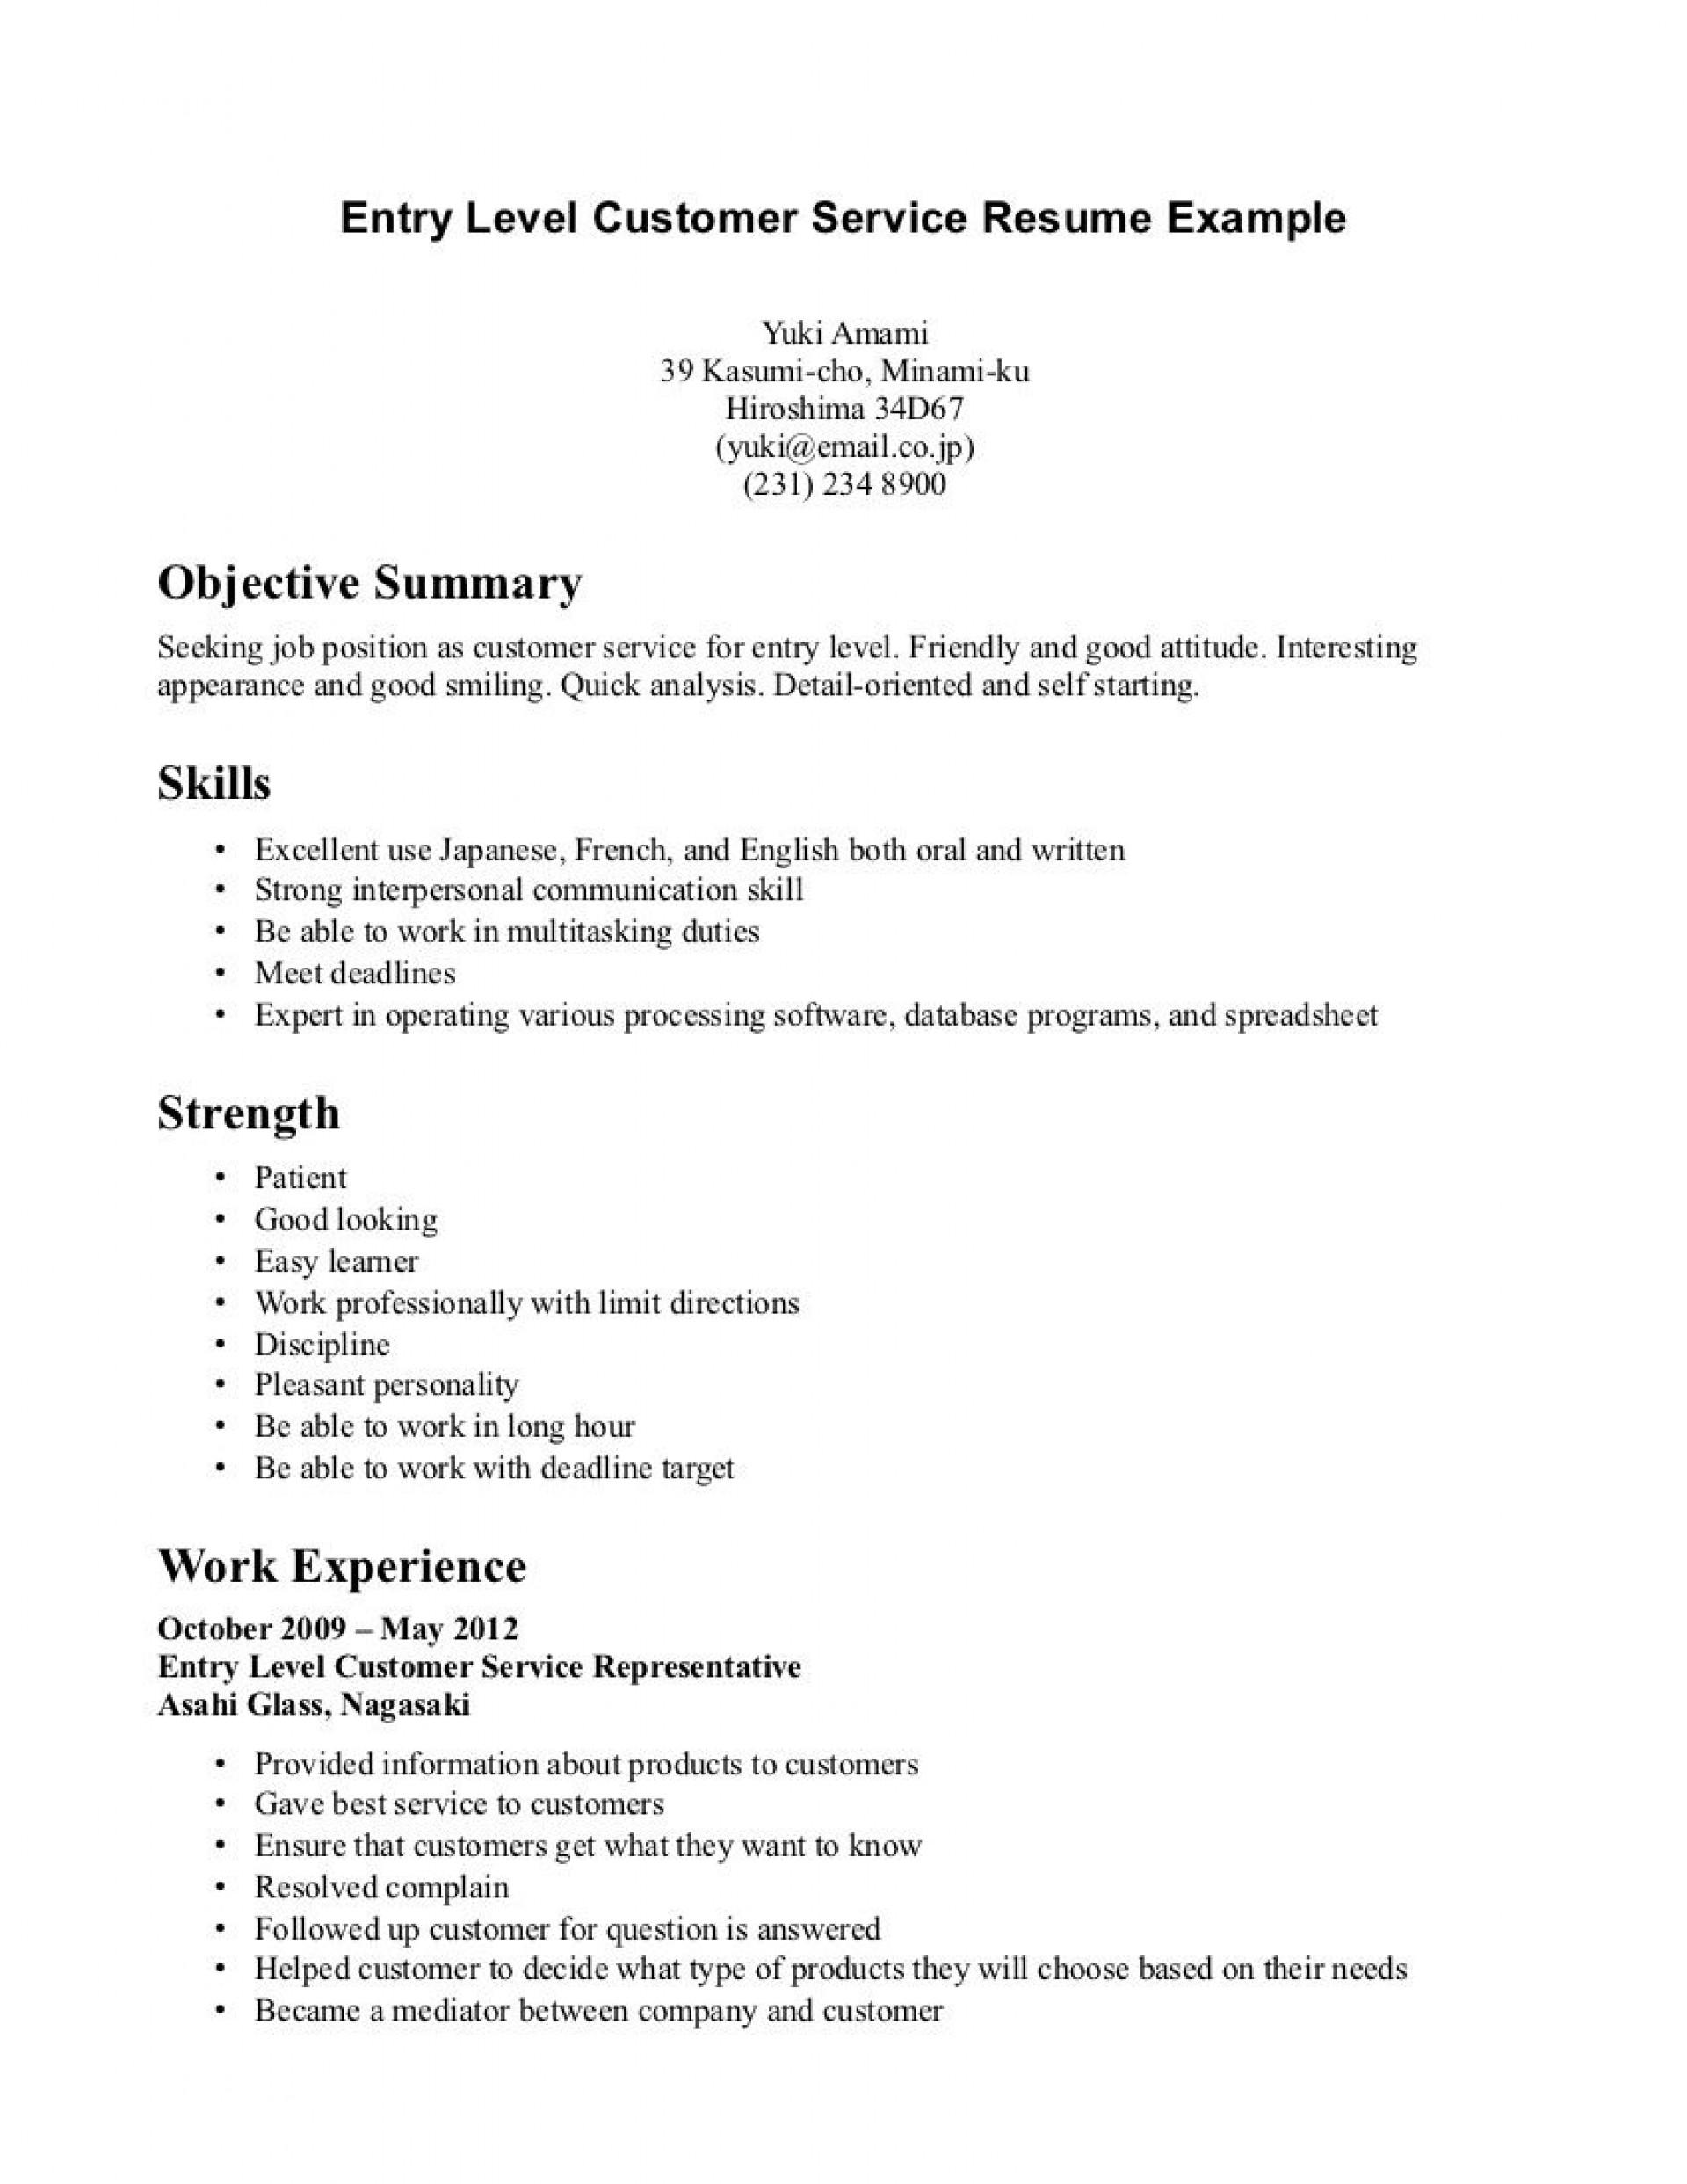 Resume Example For Entry Level Jobs لم يسبق له مثيل الصور Tier3 Xyz